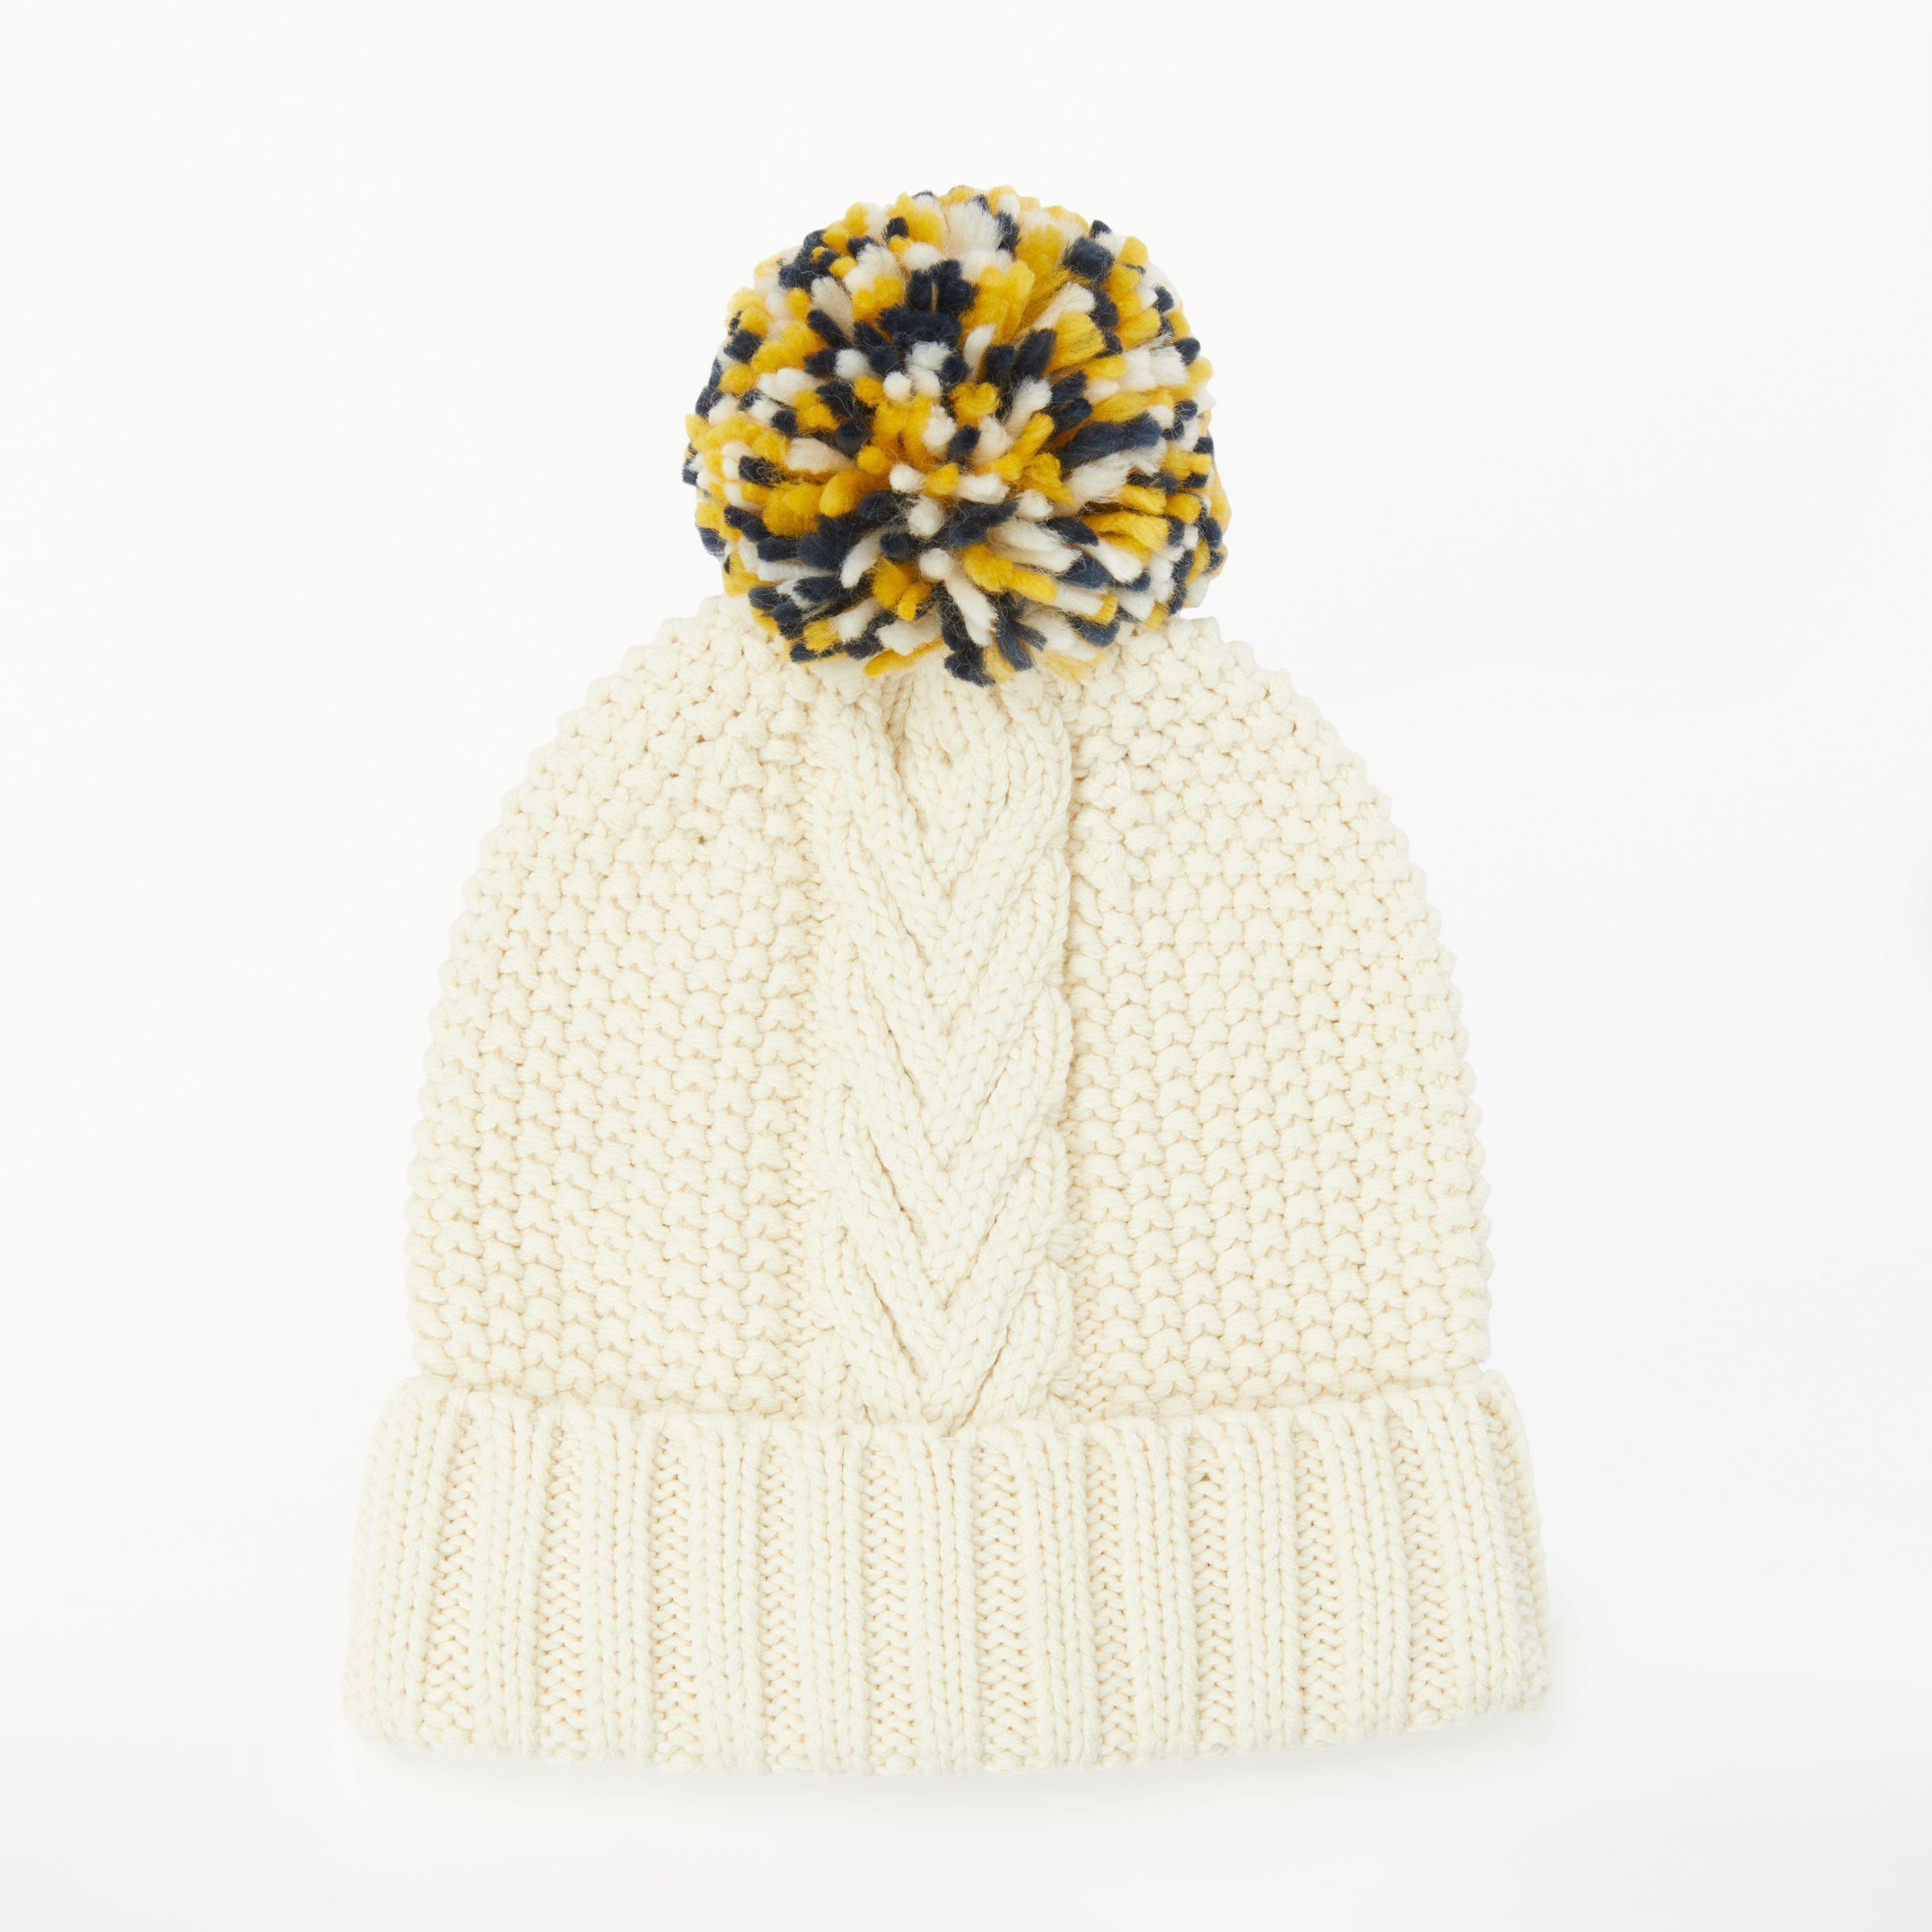 f8345cd0634 Gallery. Women s Trilby Hats Women s Yellow Beanies ...